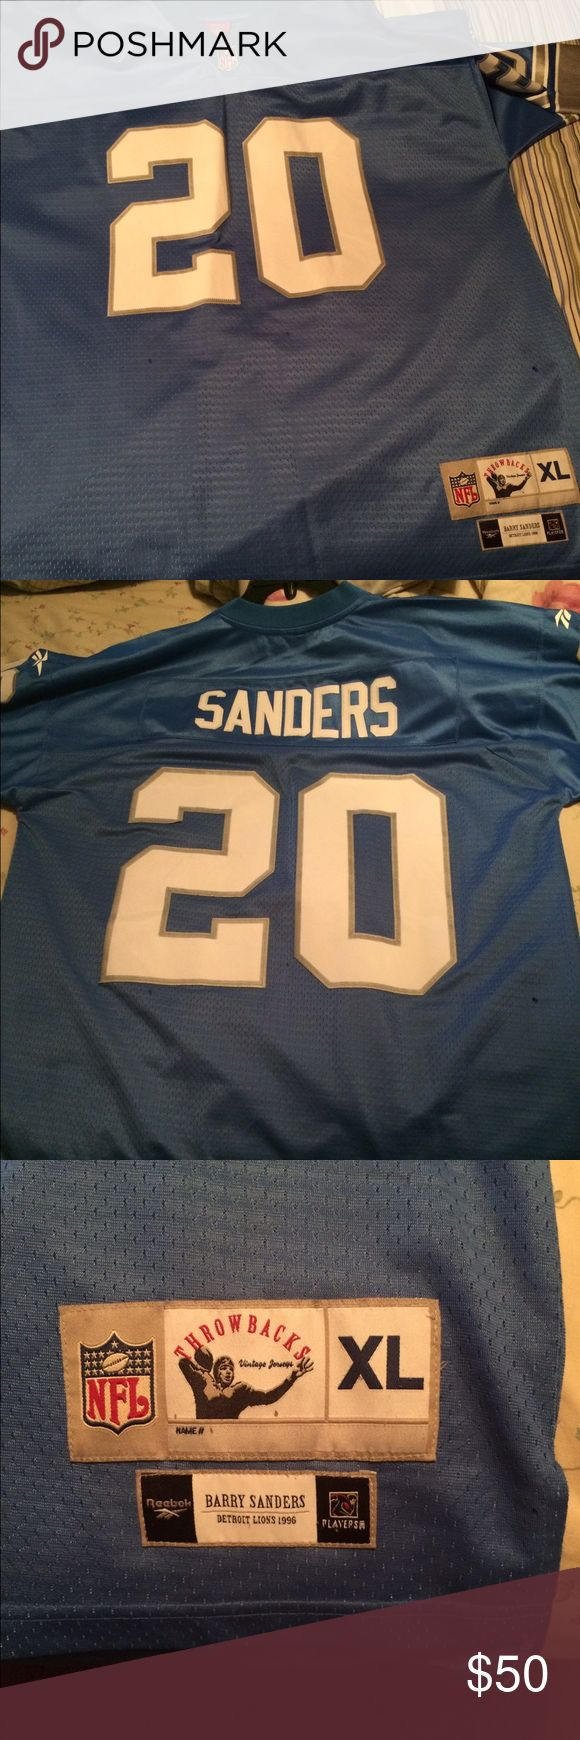 Barry Sanders Detroit Lions Jersey Reebok Detroit Lions Barry Sanders throwback jersey. Size XL Reebok Shirts Tees - Short Sleeve